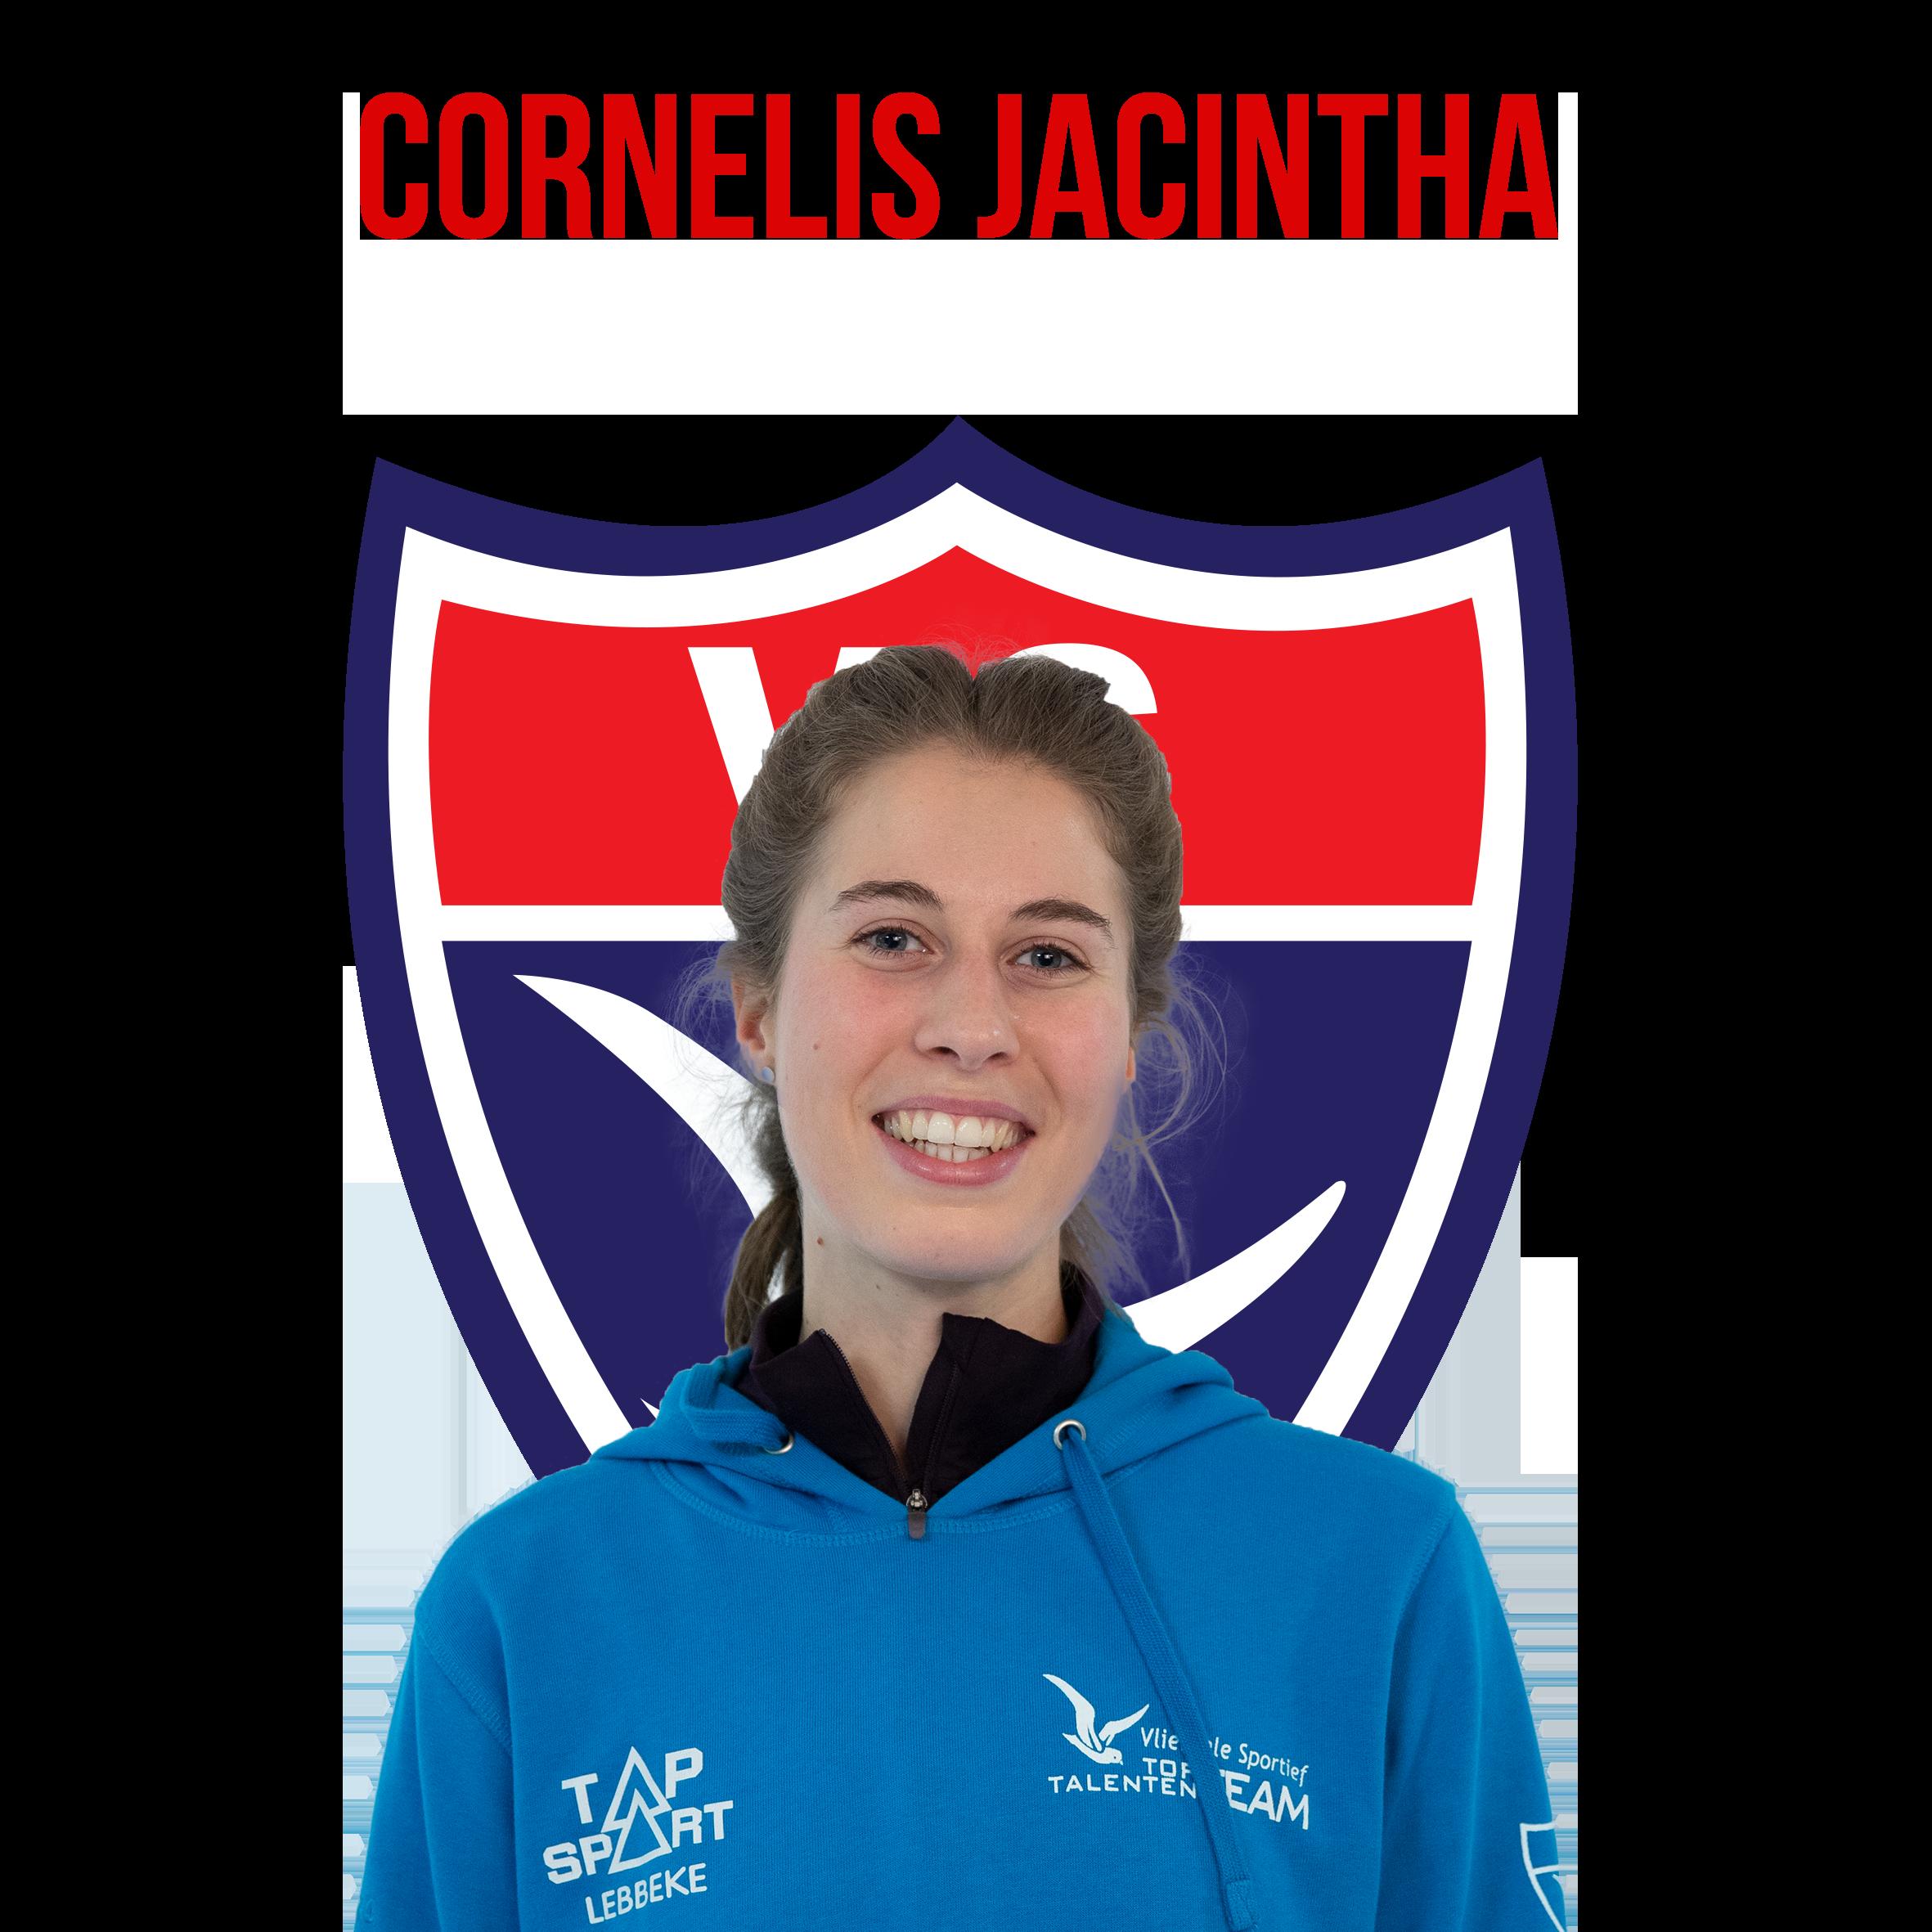 Cornelis_Jacintha